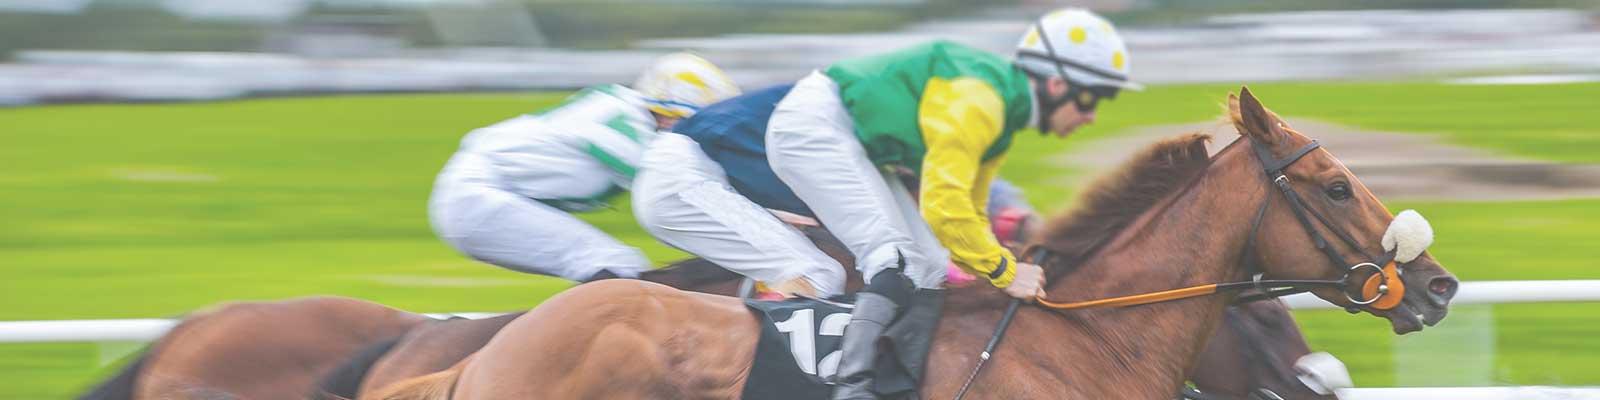 Pro Jockey Disability Insurance